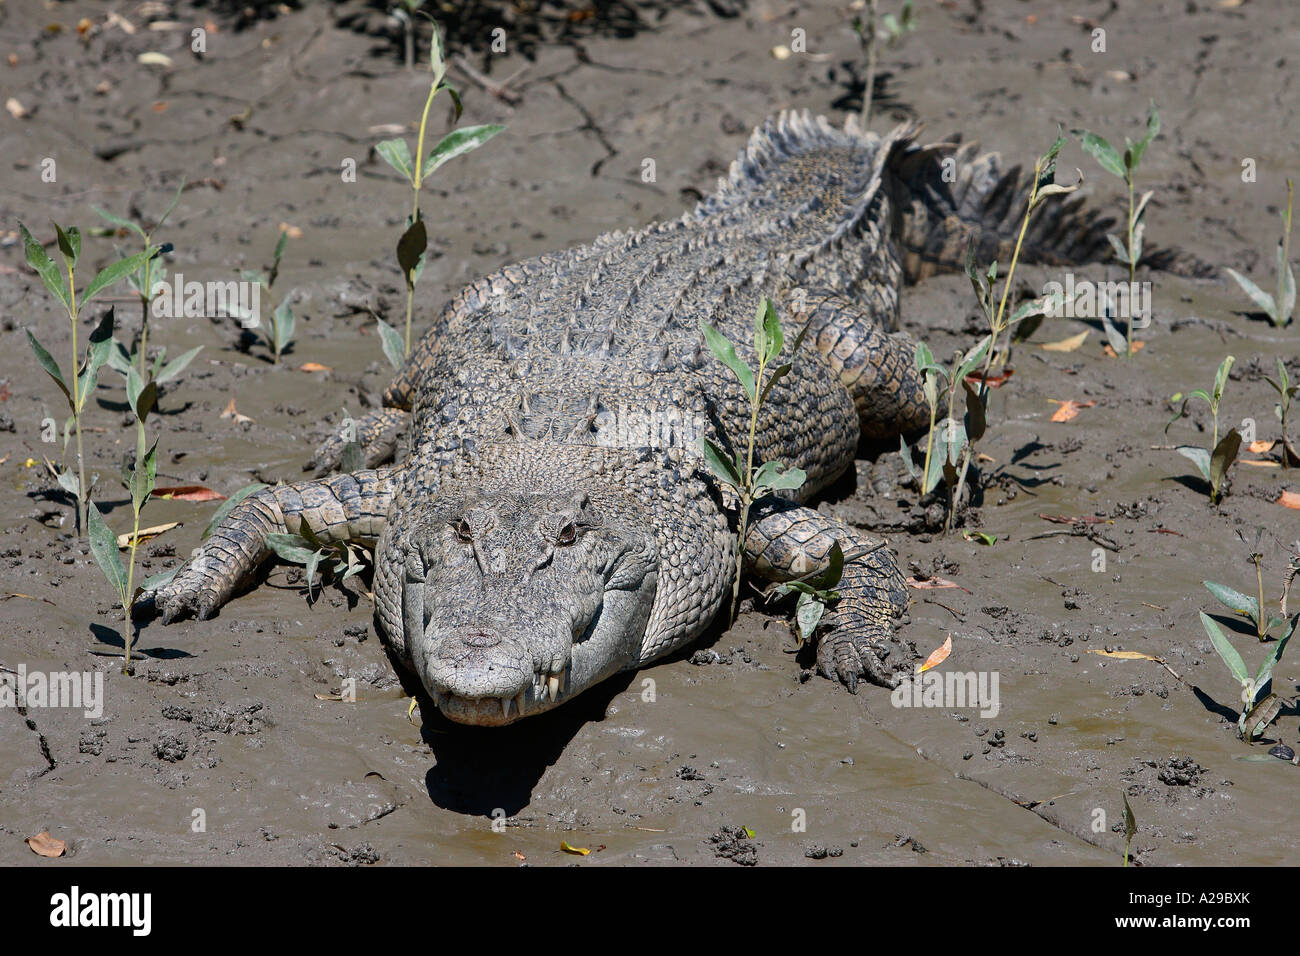 Estuarine Crocodile - Stock Image